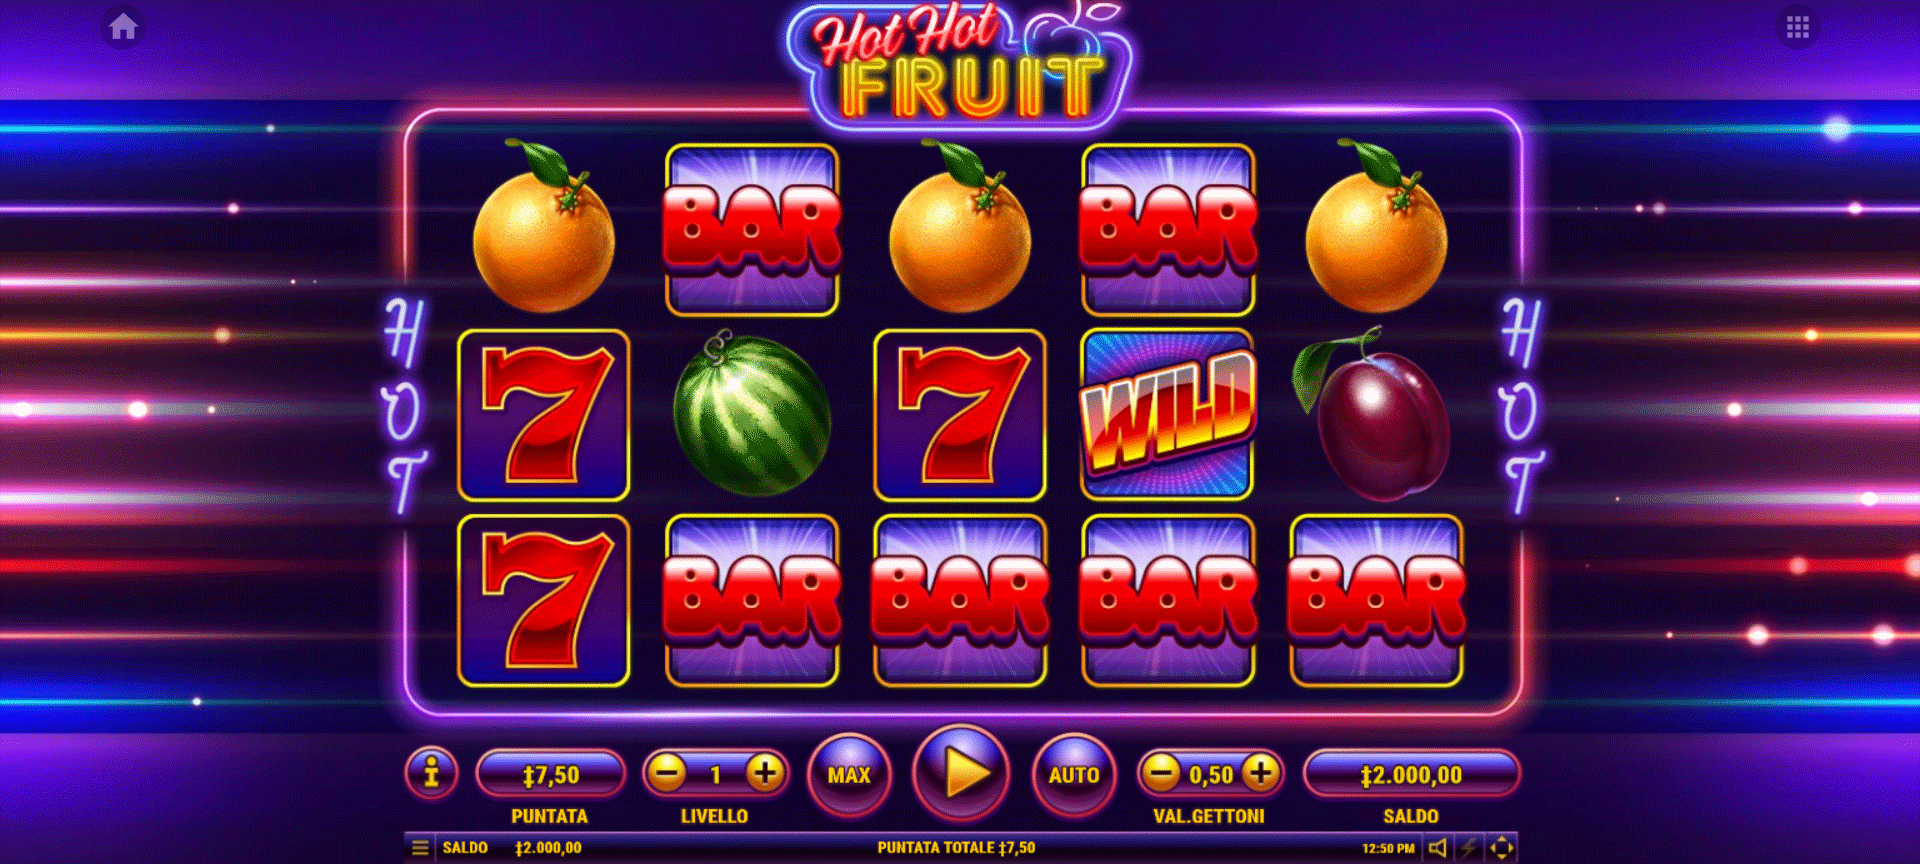 Slot Hot Hot Fruit